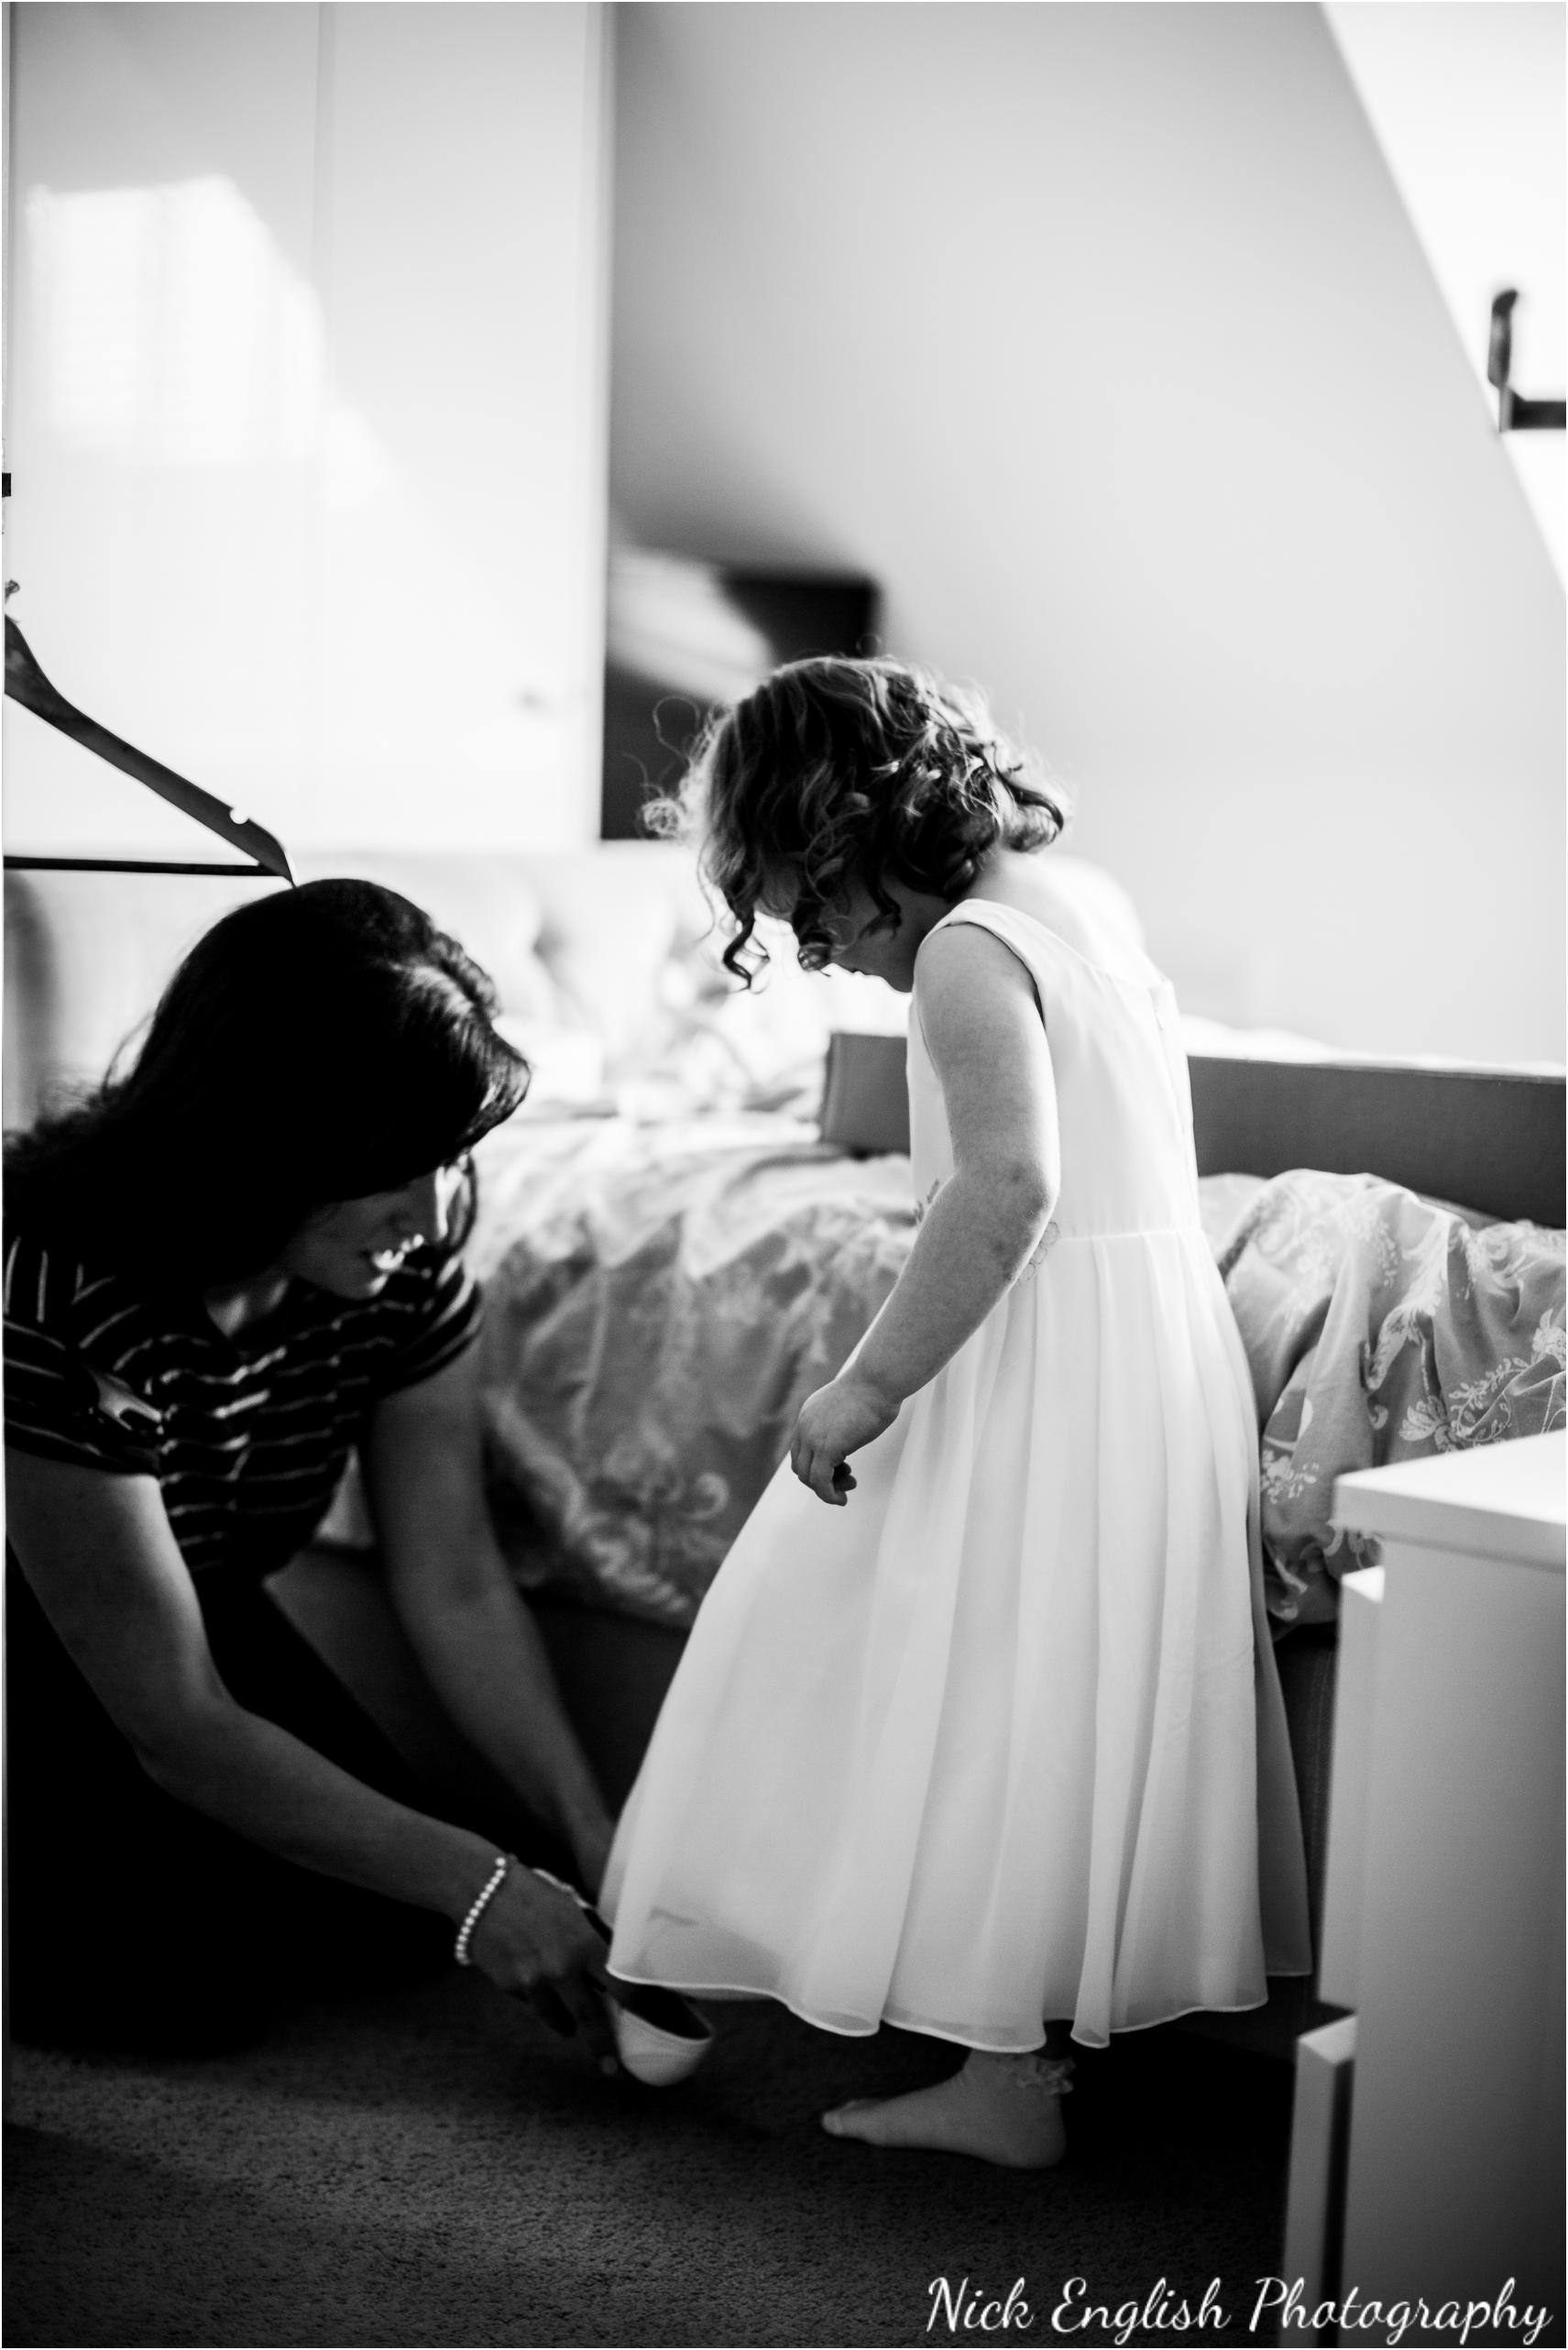 Stacey-Ash-Wedding-Photographs-Stanley-House-Preston-Lancashire-30.jpg